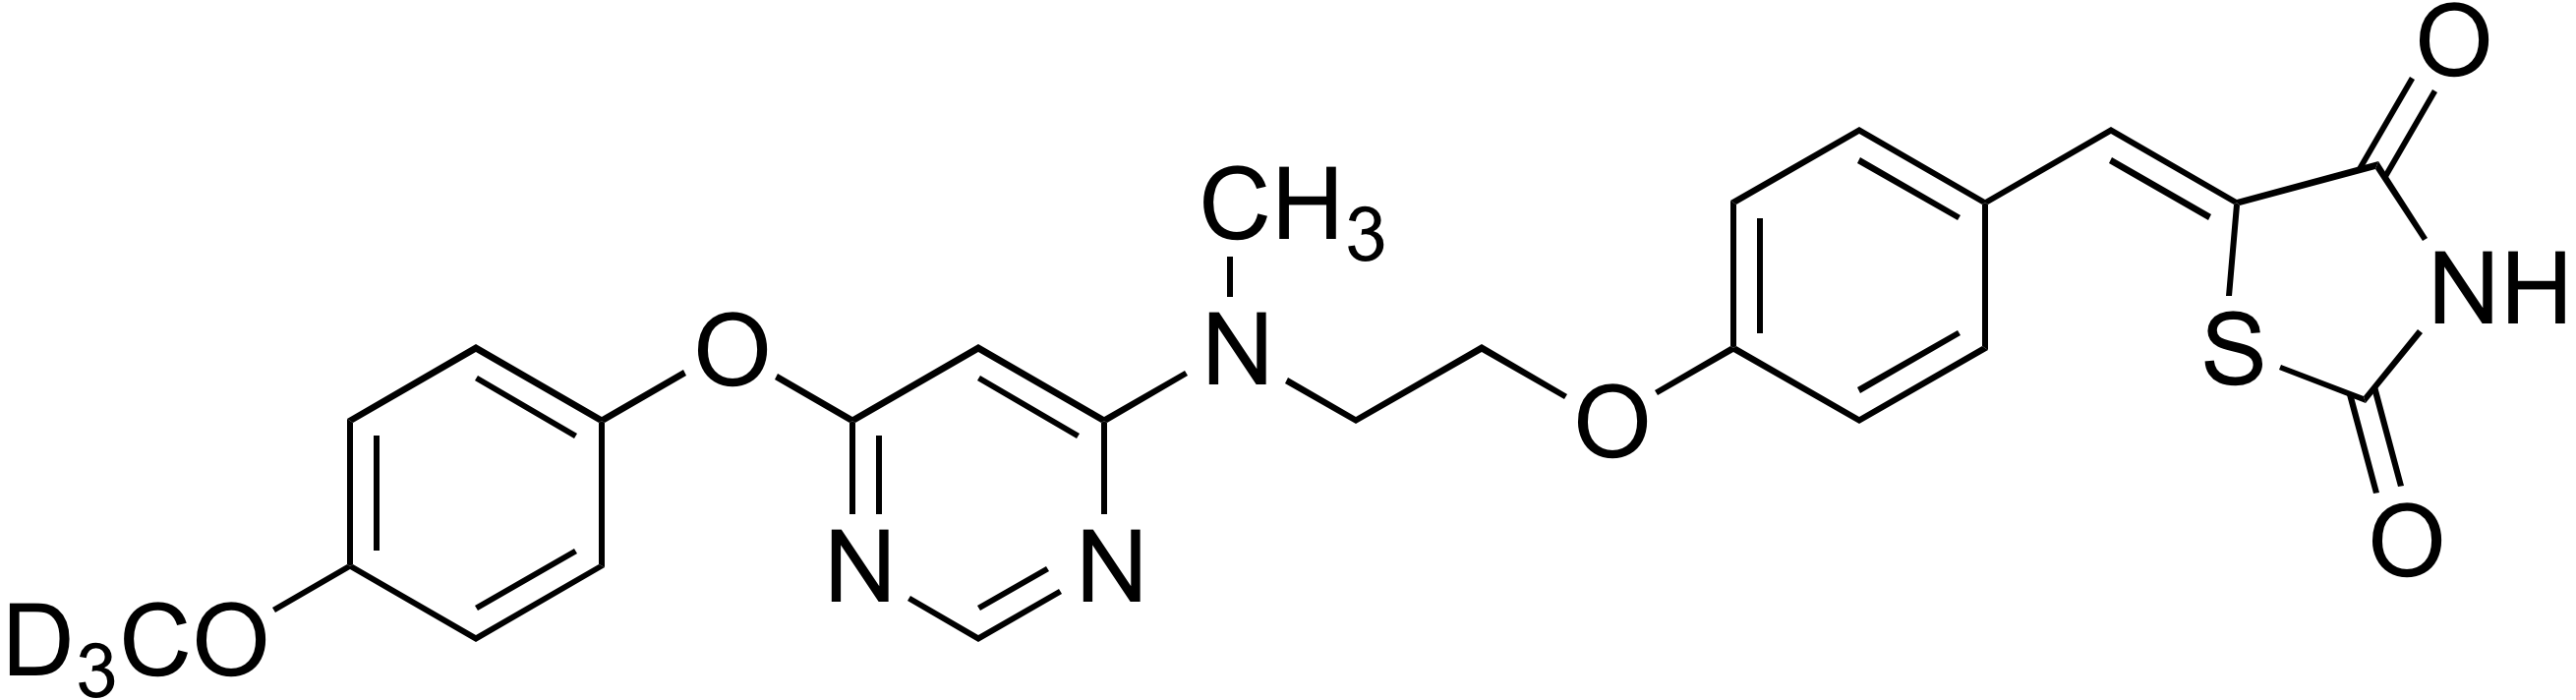 5-[4-(2-{[6-(4-Methoxy-d<sub>3</sub> phenoxy)pyrimidin-4-yl]methylamino}ethoxy)benzylidene]thiazolidine-2,4-dione